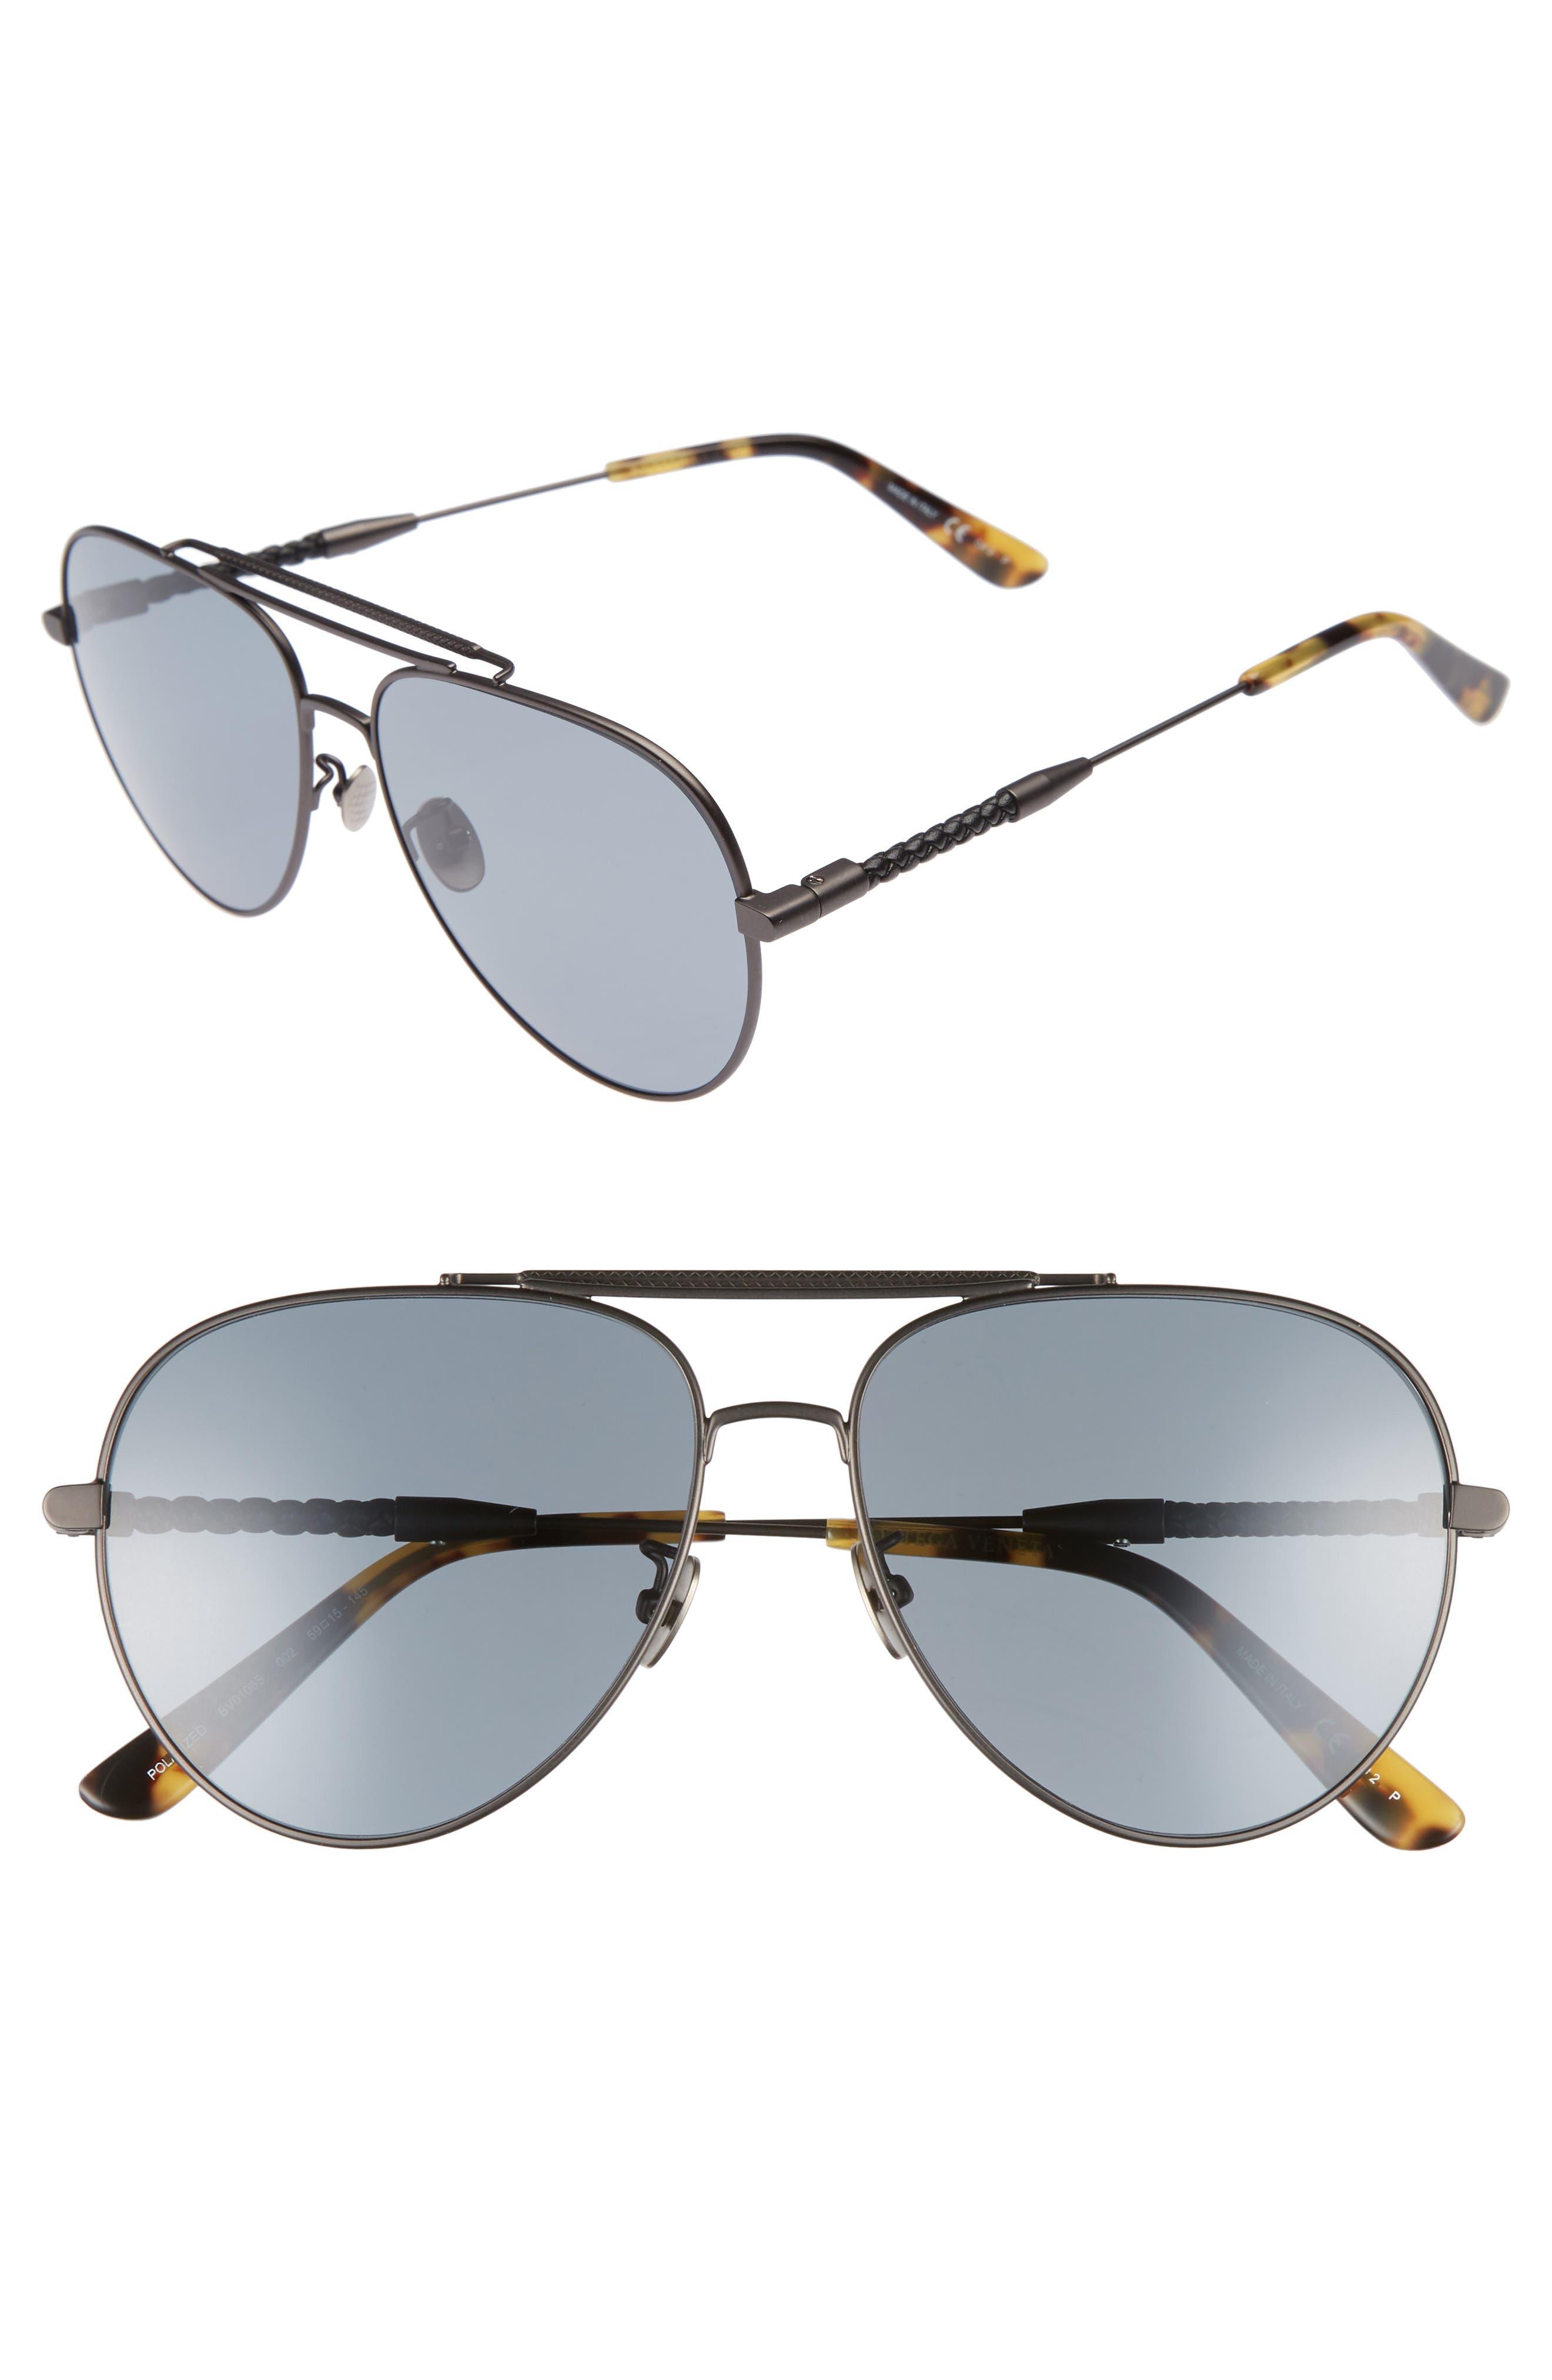 59m Polarized Aviator Sunglasses,                             Main thumbnail 1, color,                             Ruthenium